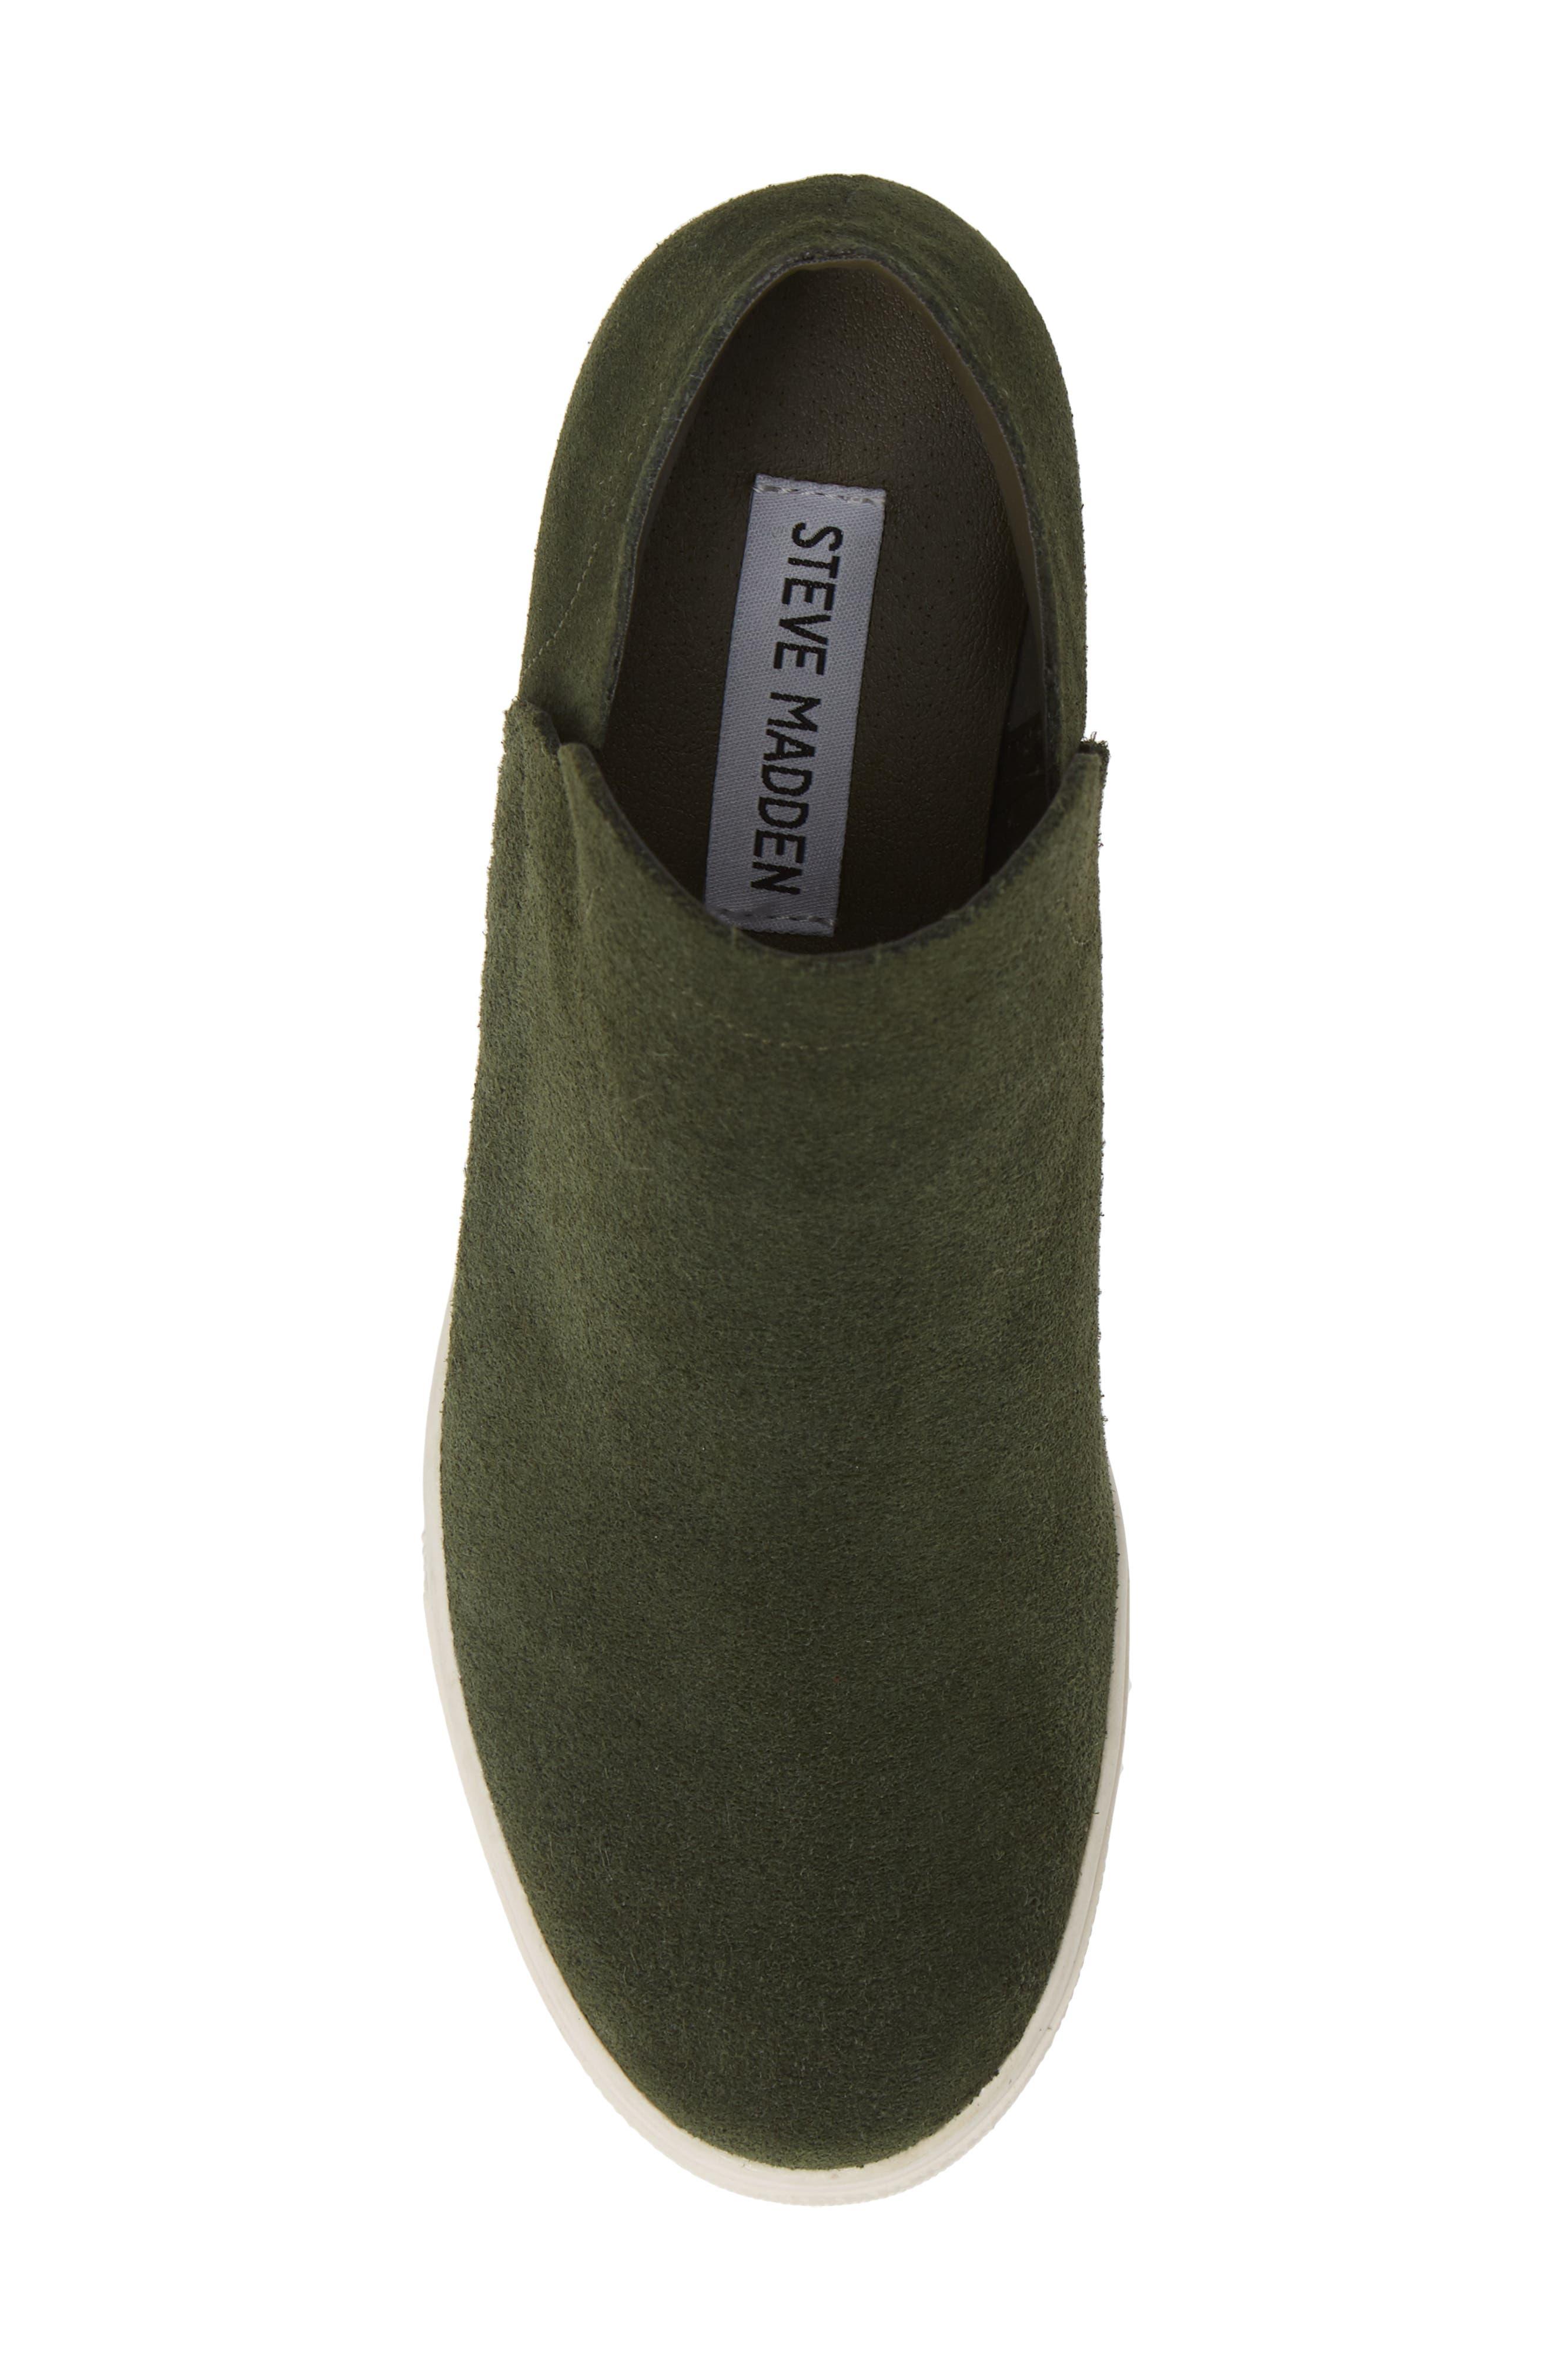 STEVE MADDEN, Wrangle Sneaker, Alternate thumbnail 5, color, OLIVE SUEDE